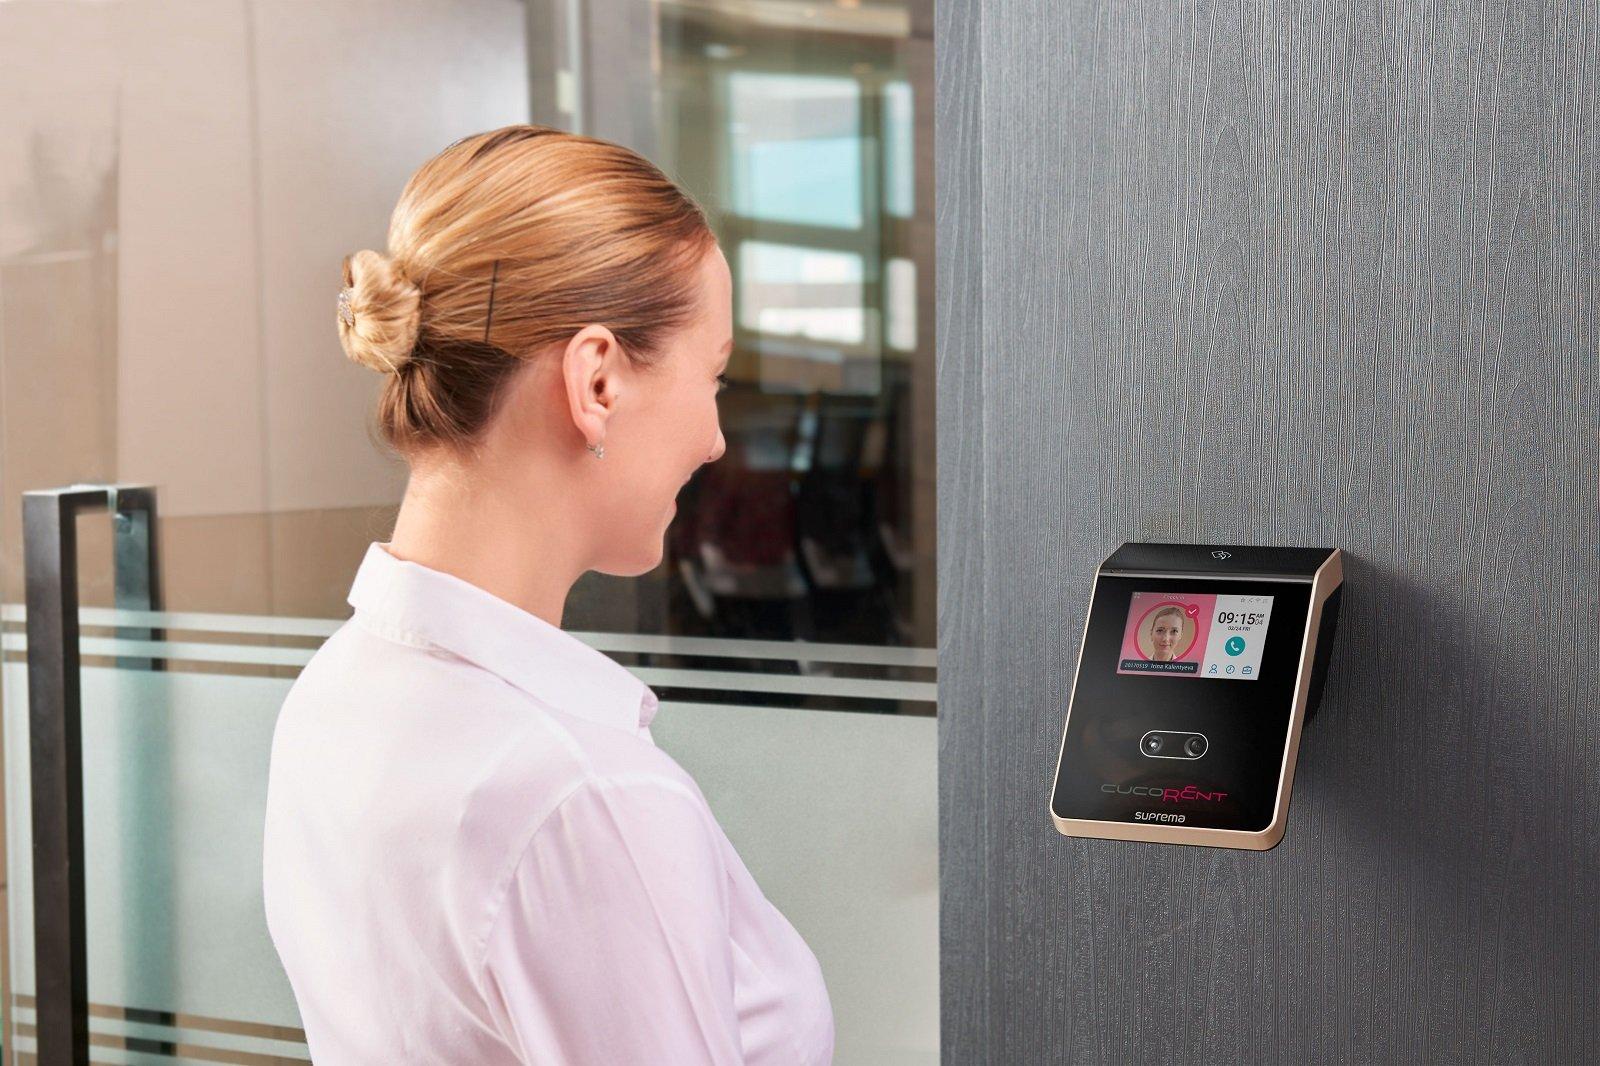 Биометрическая идентификация в офисе Lamoda